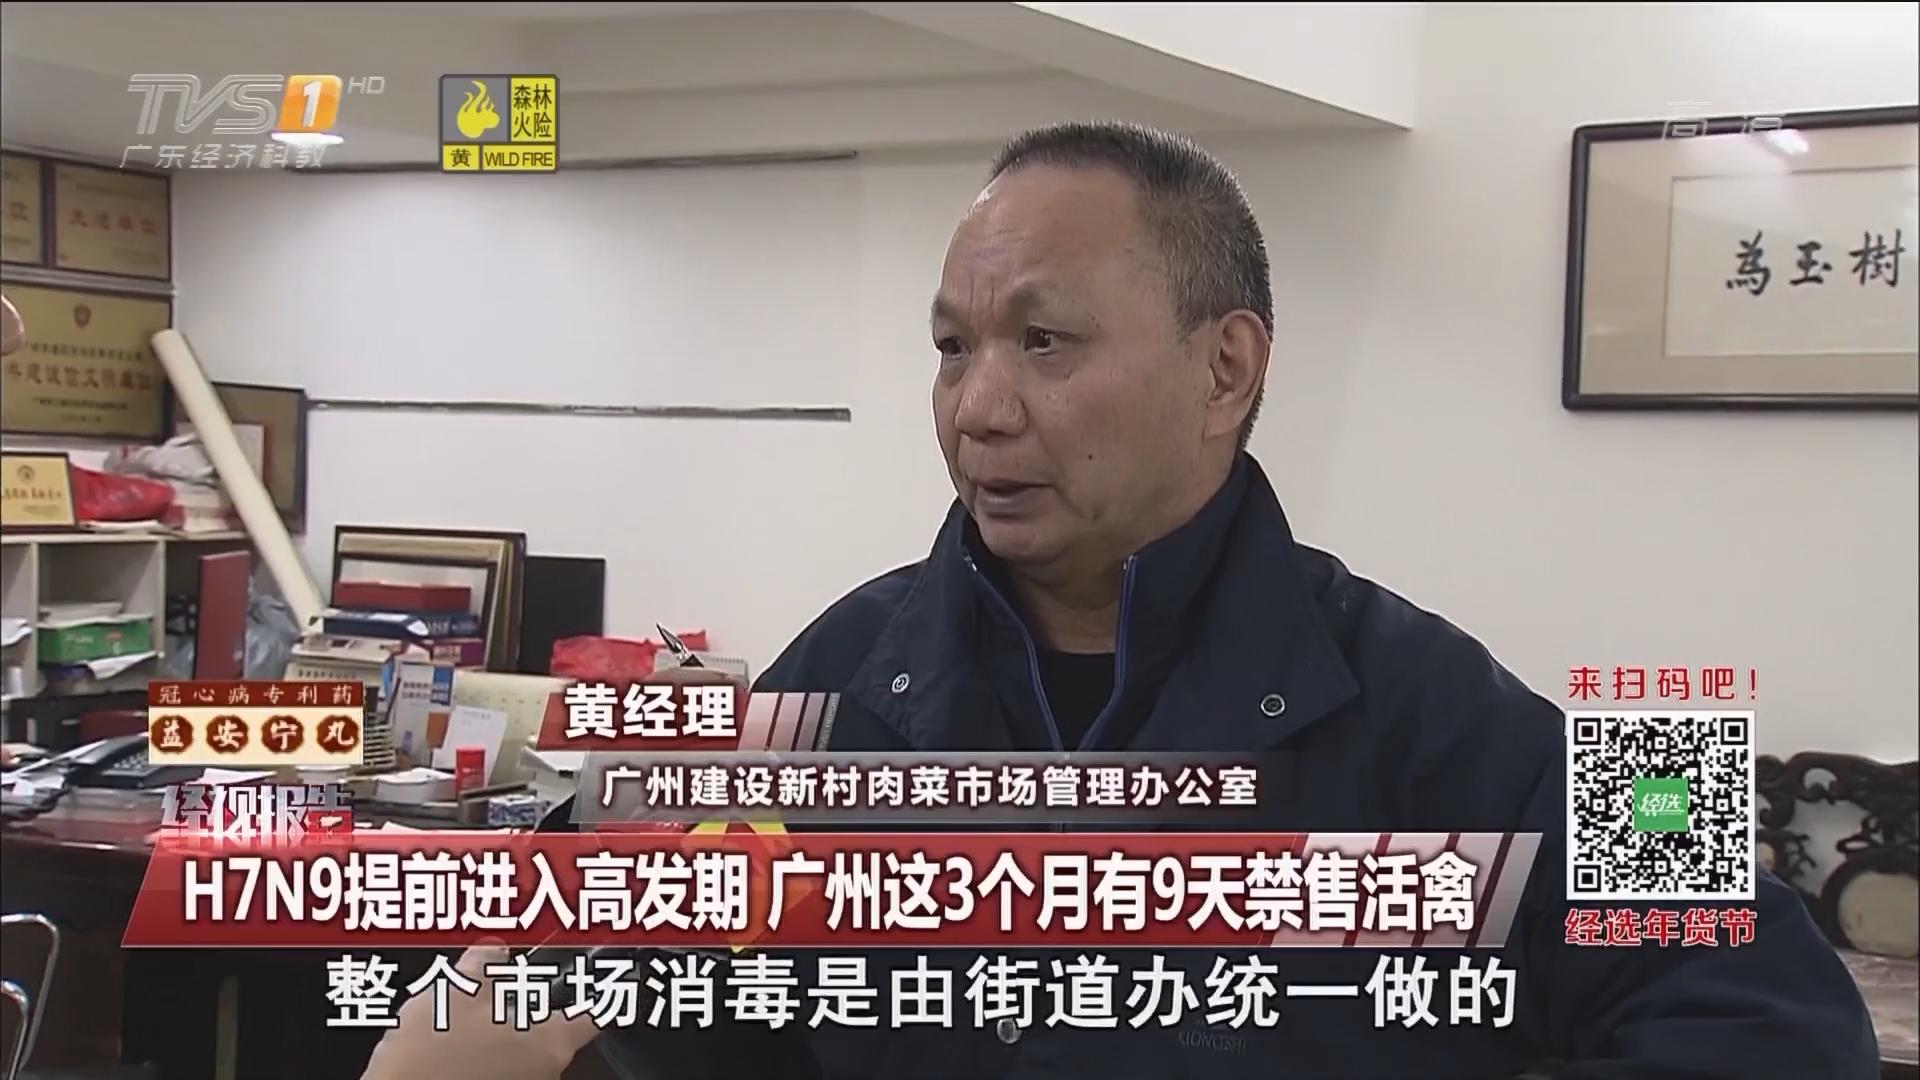 H7N9提前进入高发期 广州这3个月有9天禁售活禽